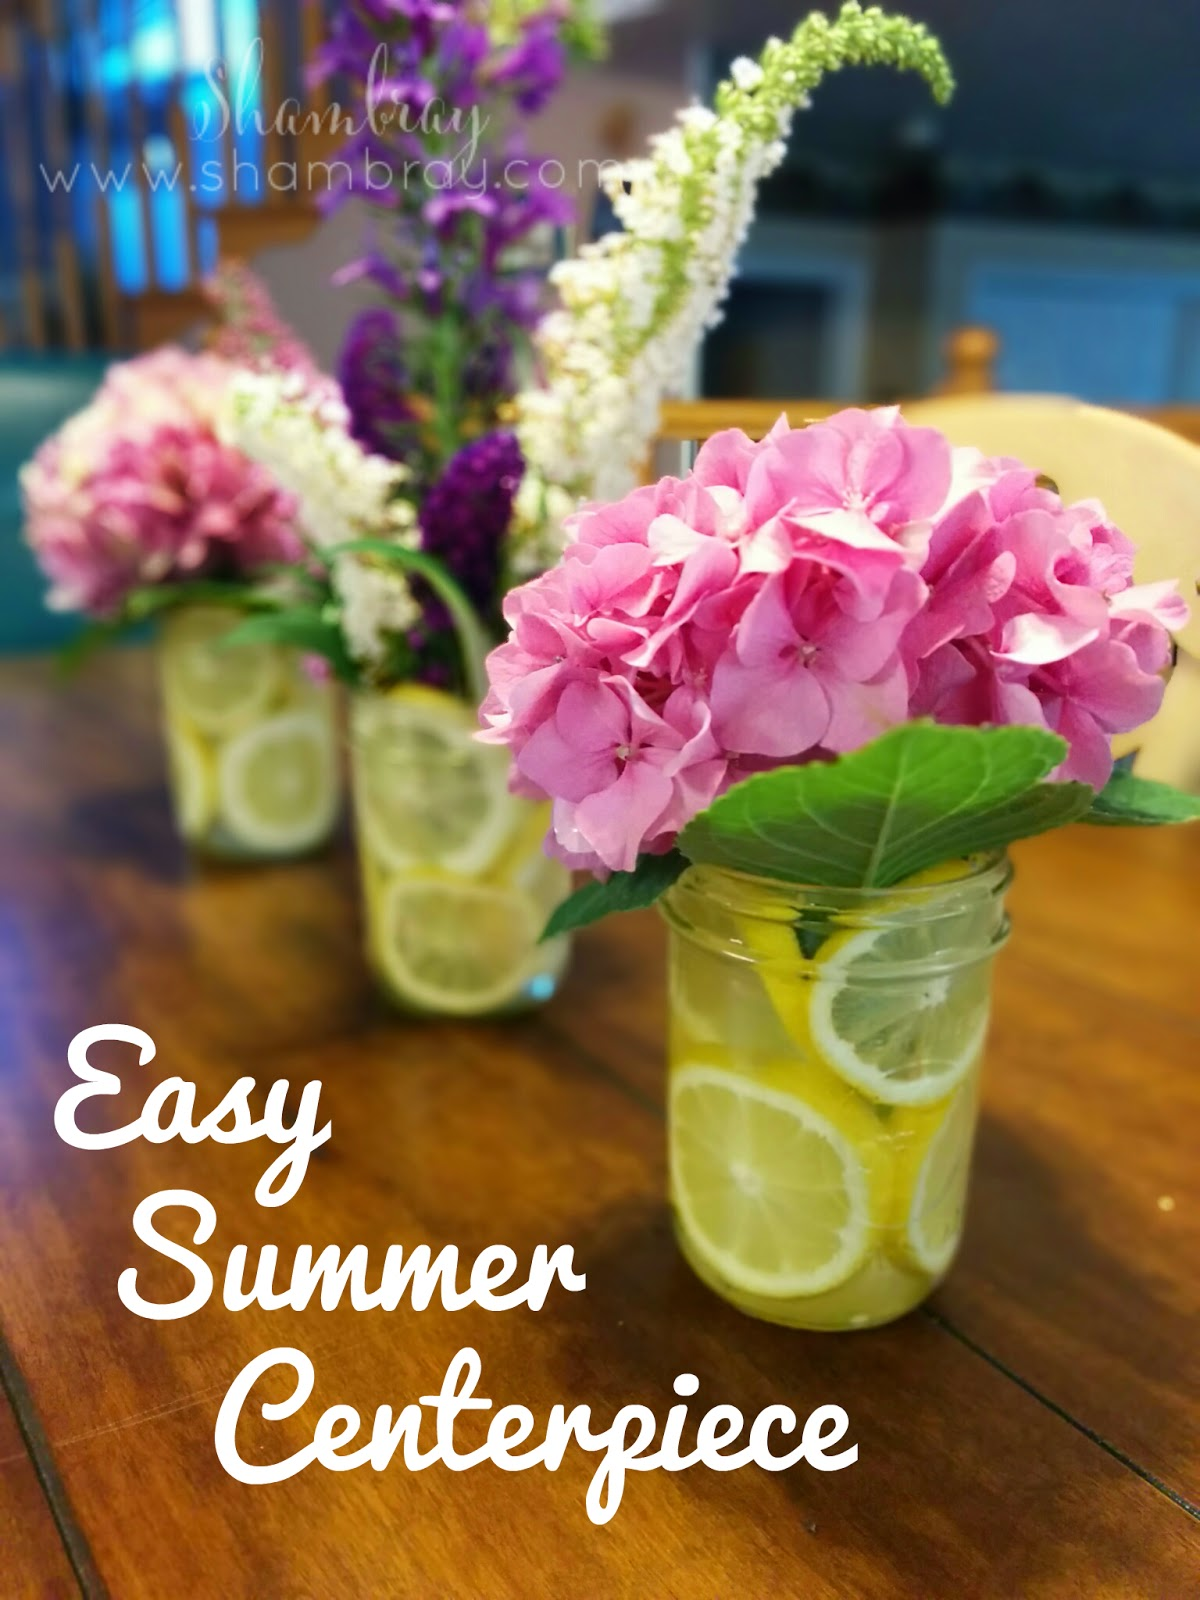 Shambray easy summer centerpiece